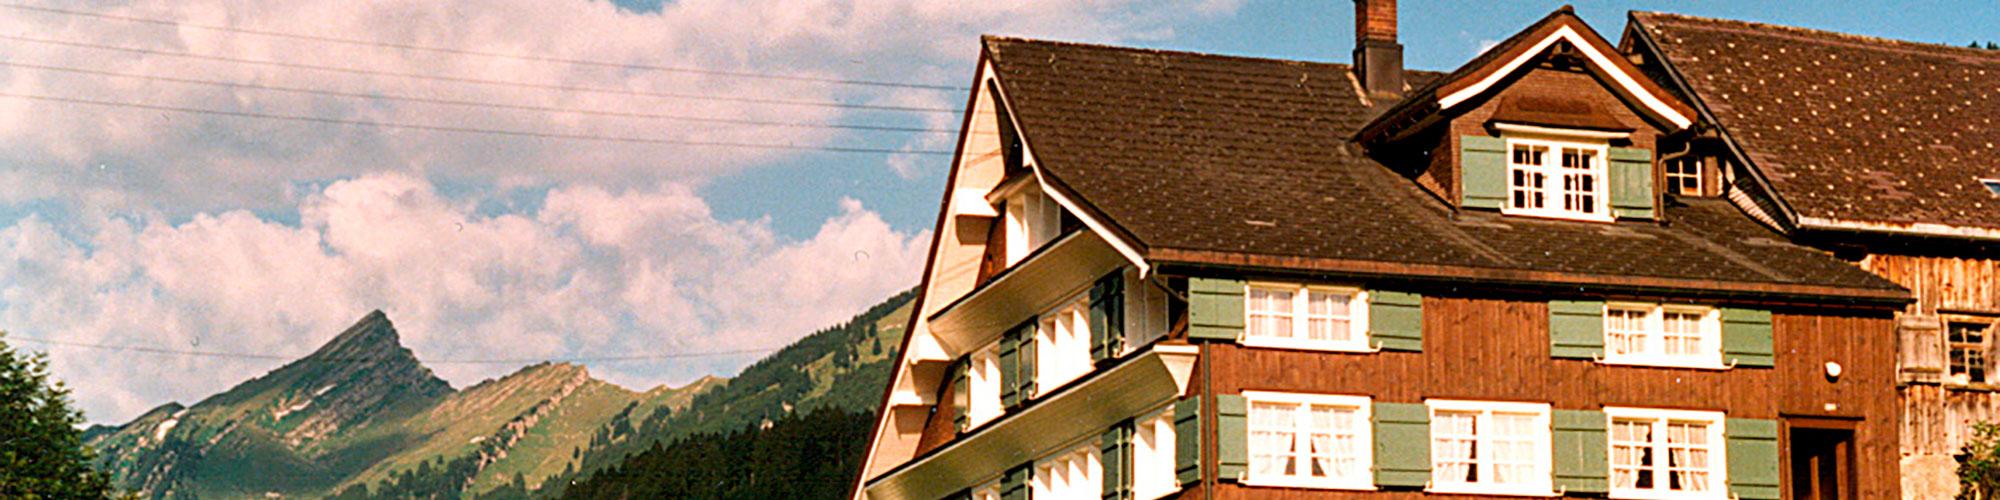 Beschreibung Des Hauses